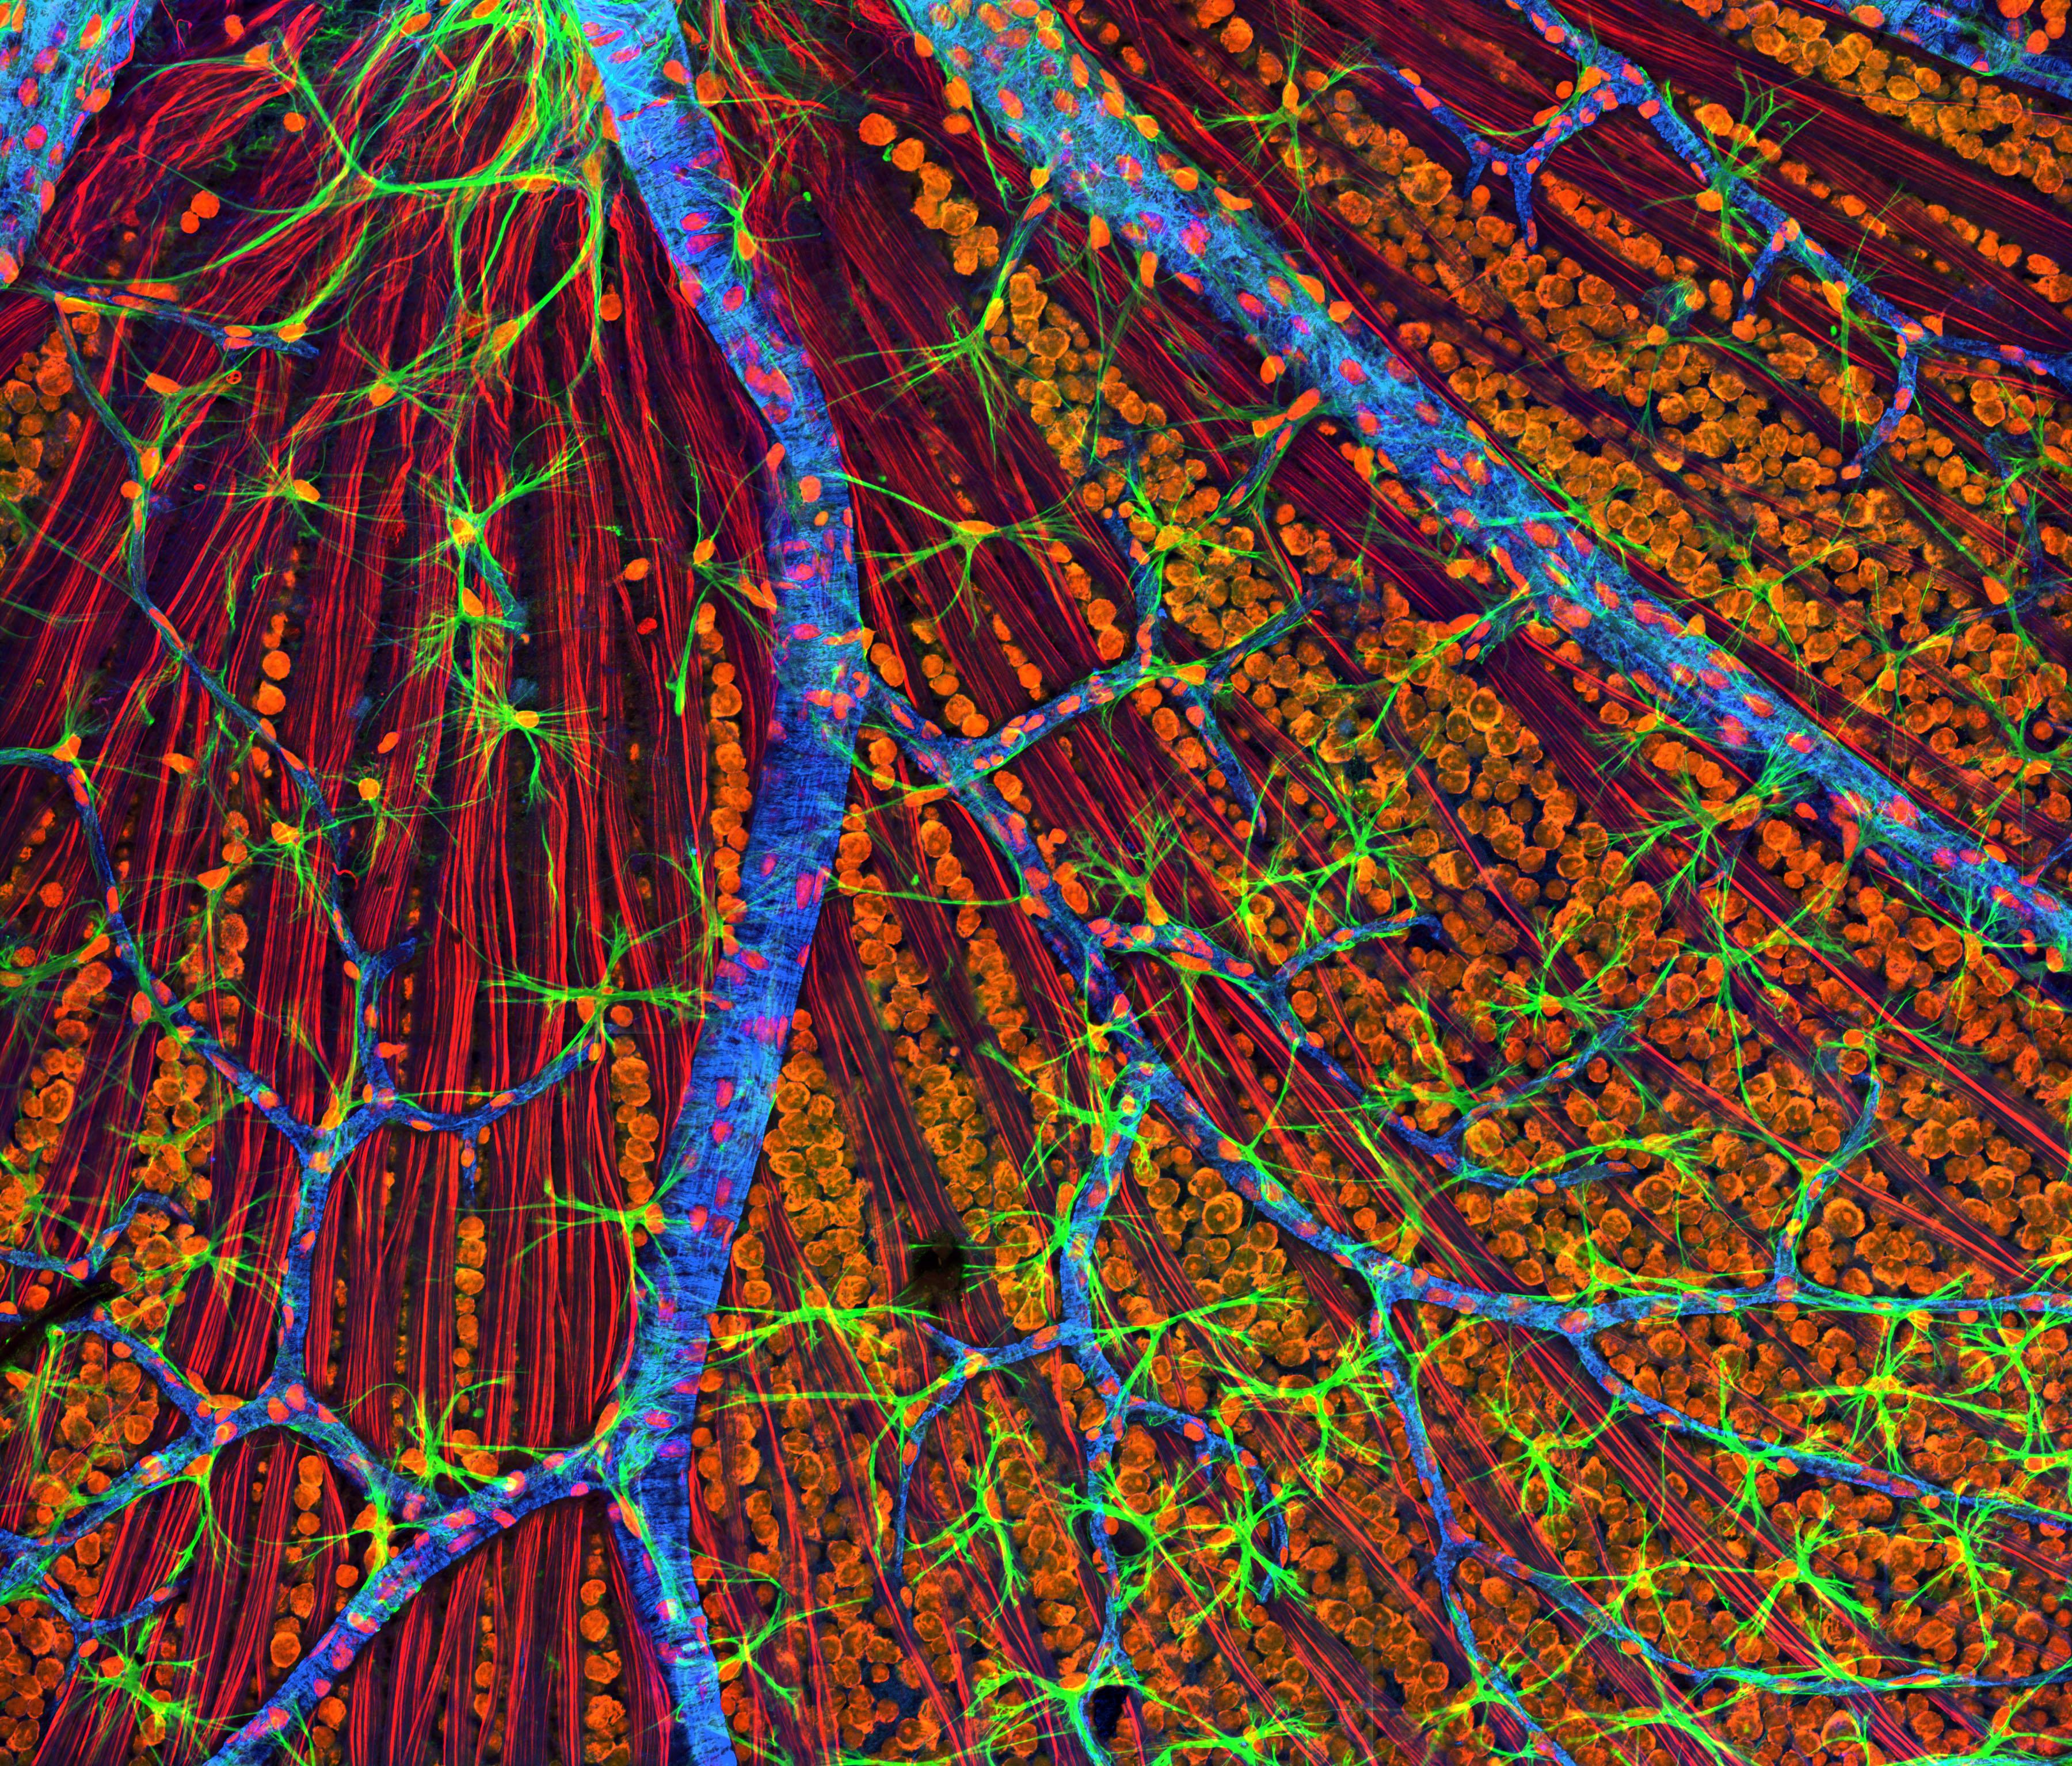 Mouse Retina